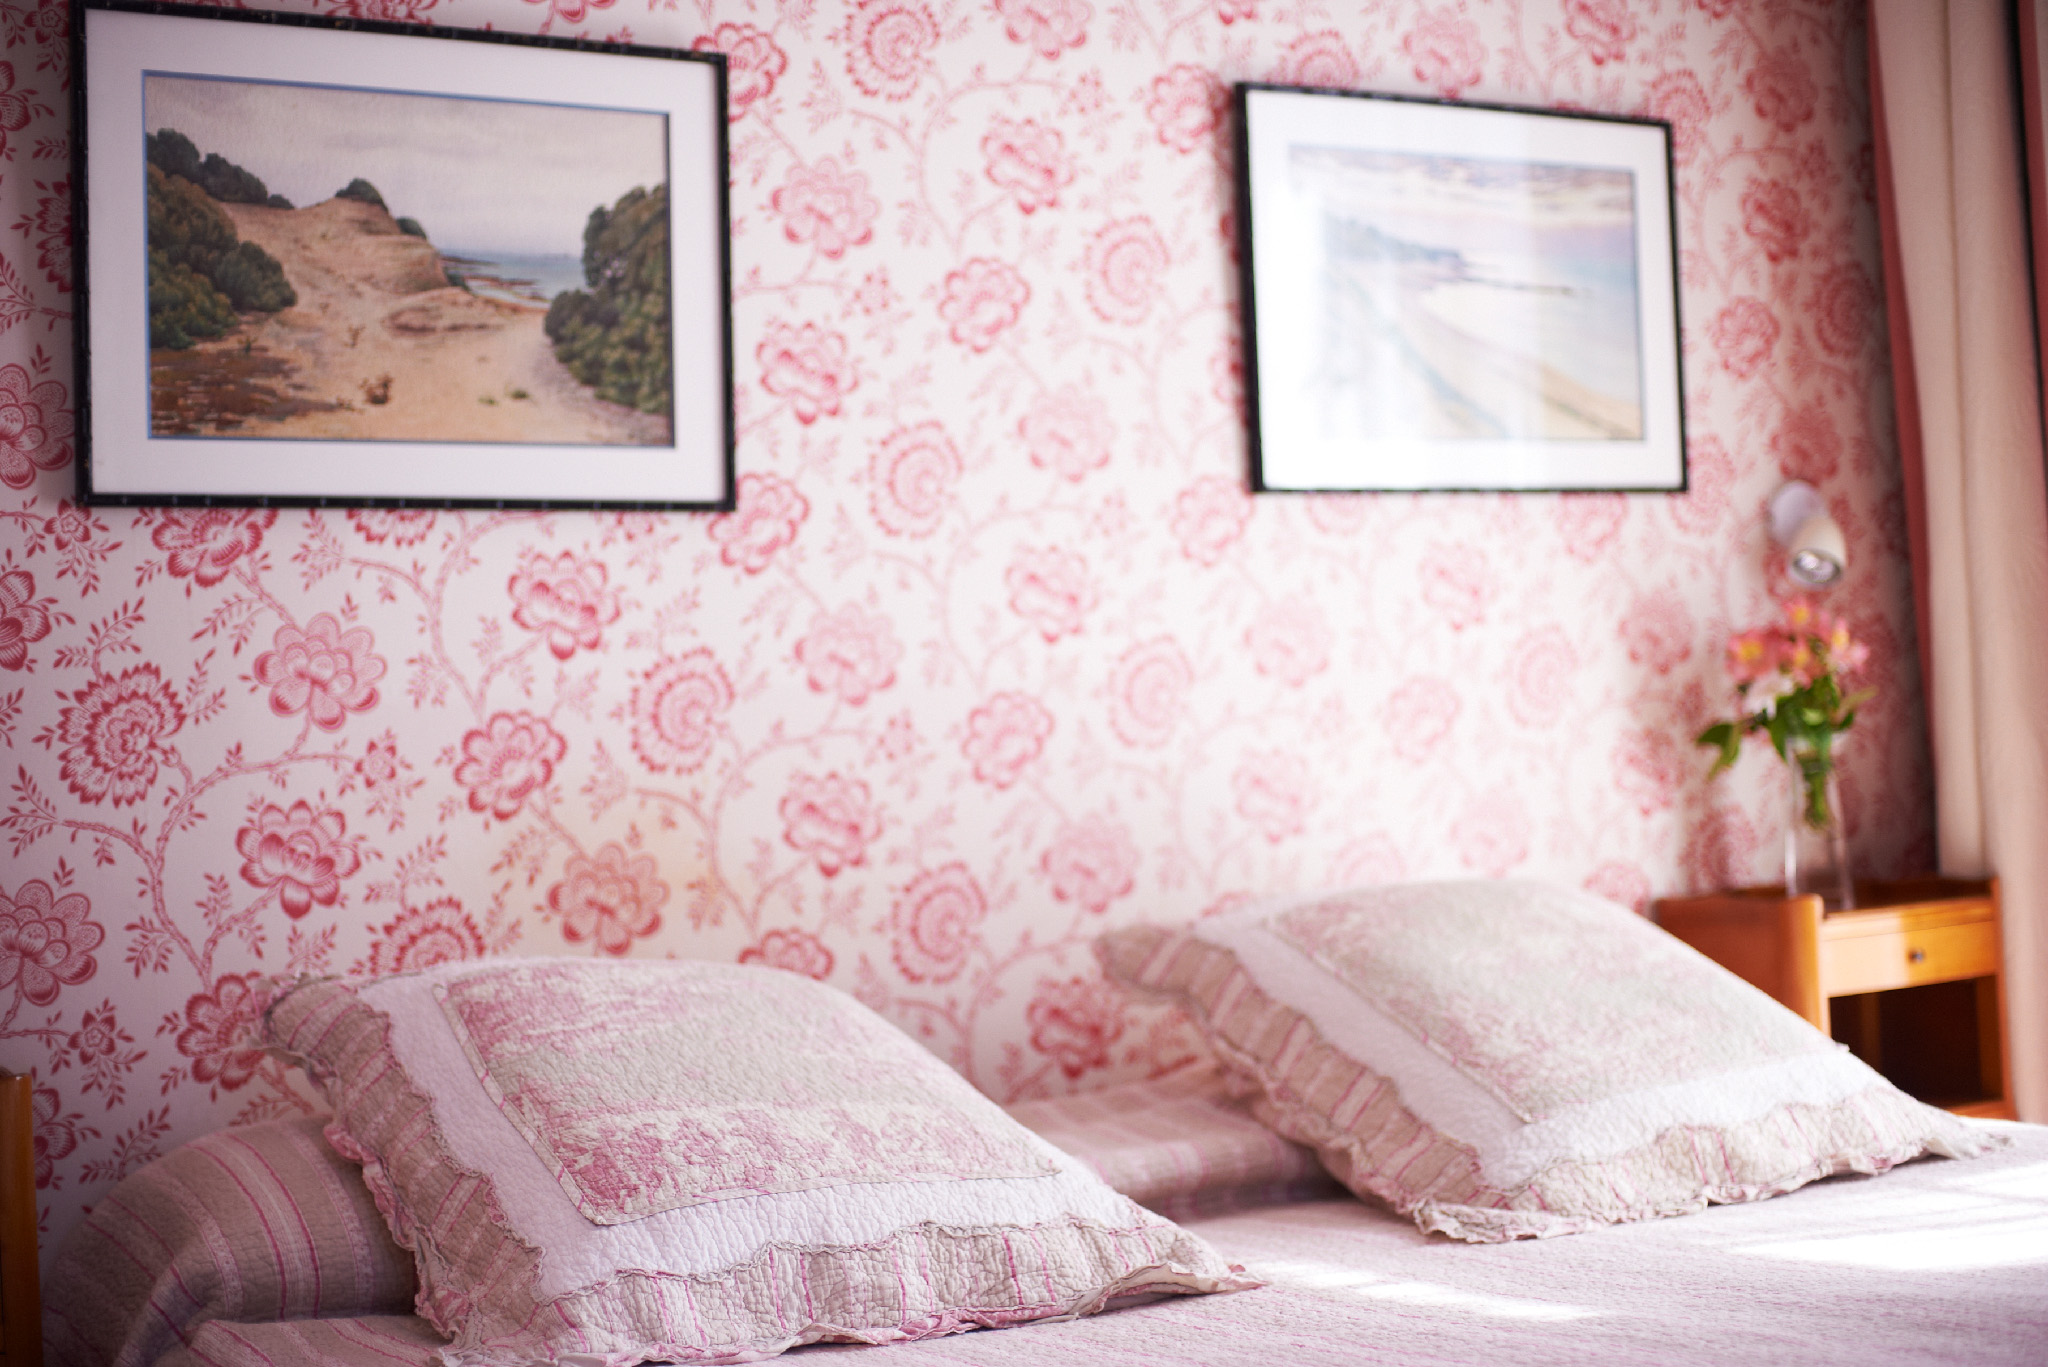 60_photographie_hotel_restaurant_nantes